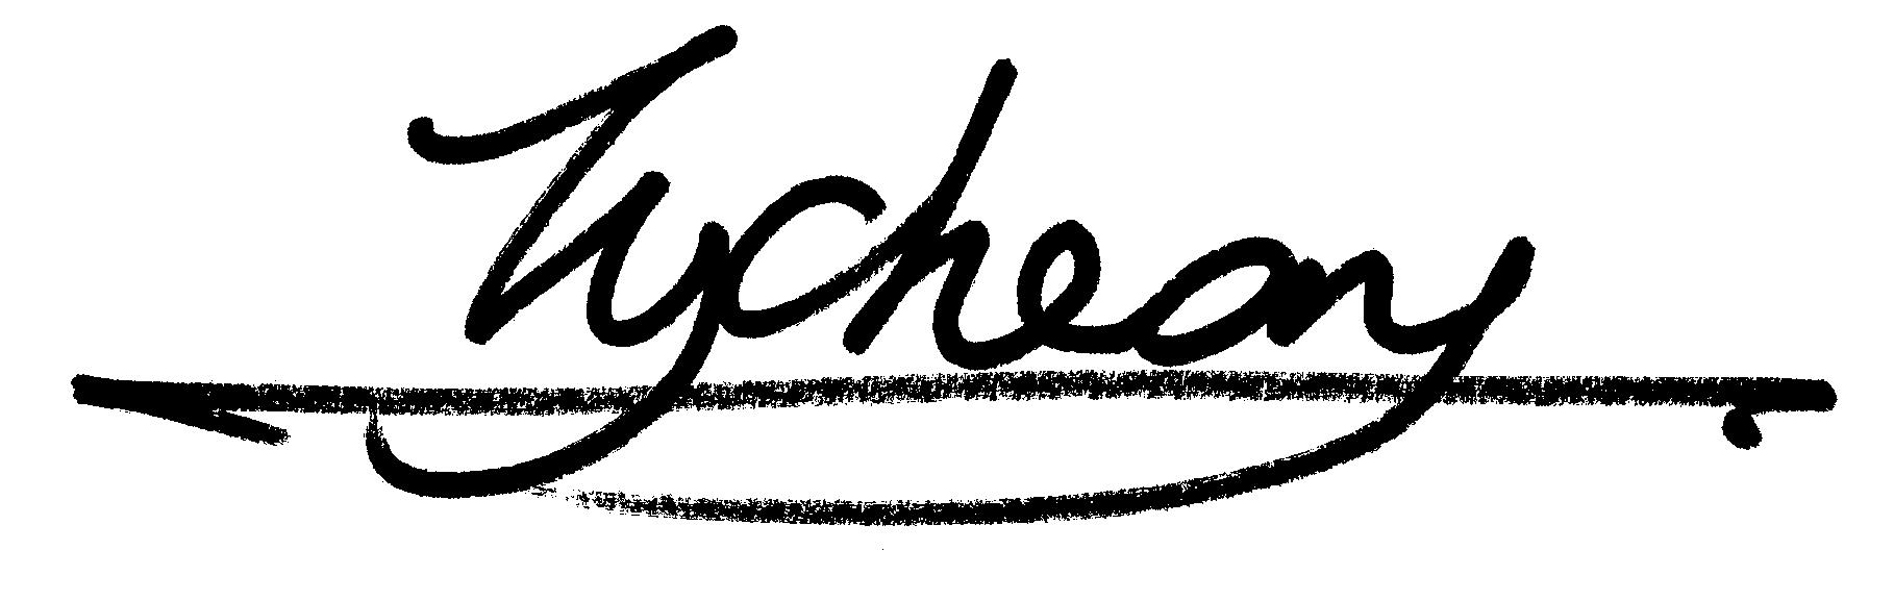 Tuckwai Cheong's Signature